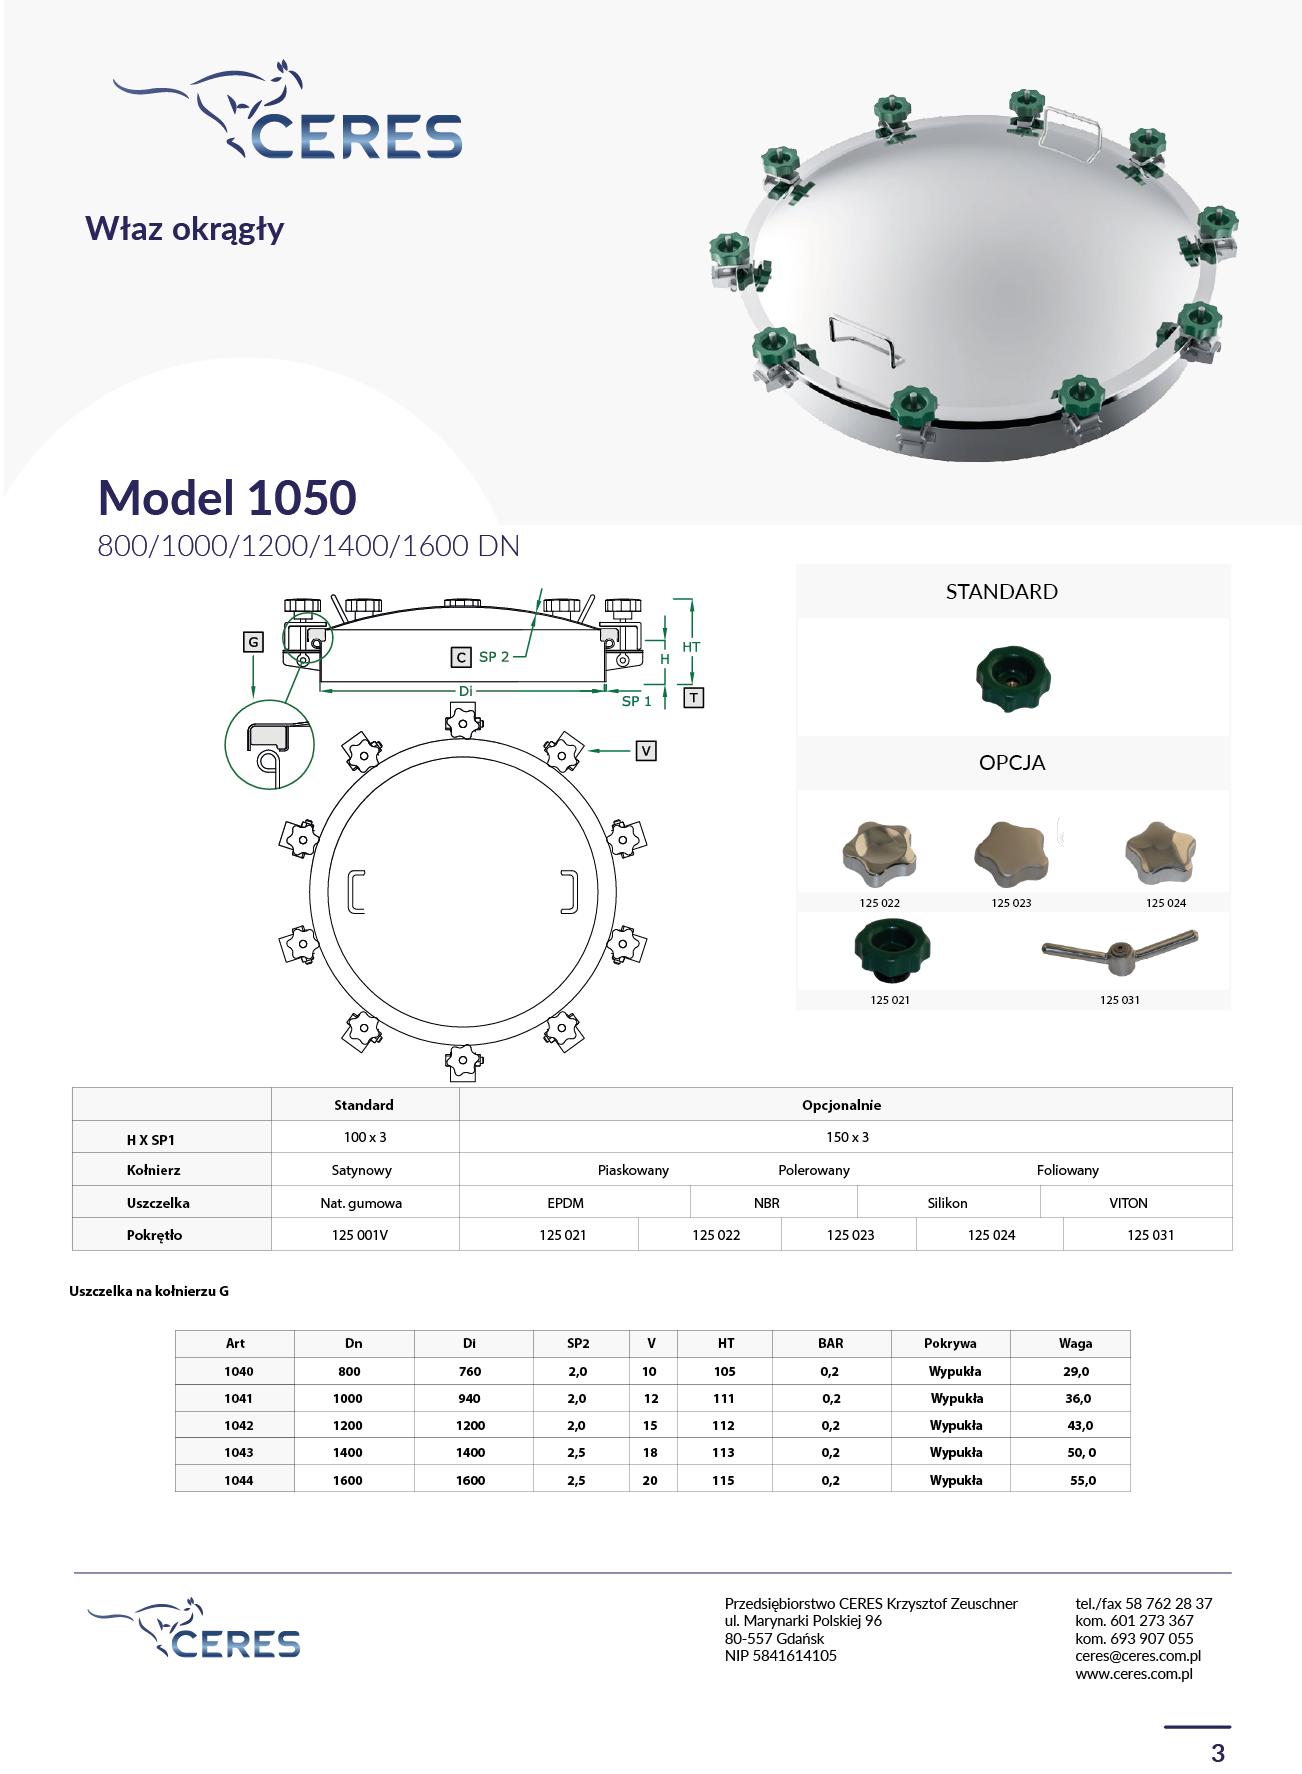 MODEL 1050